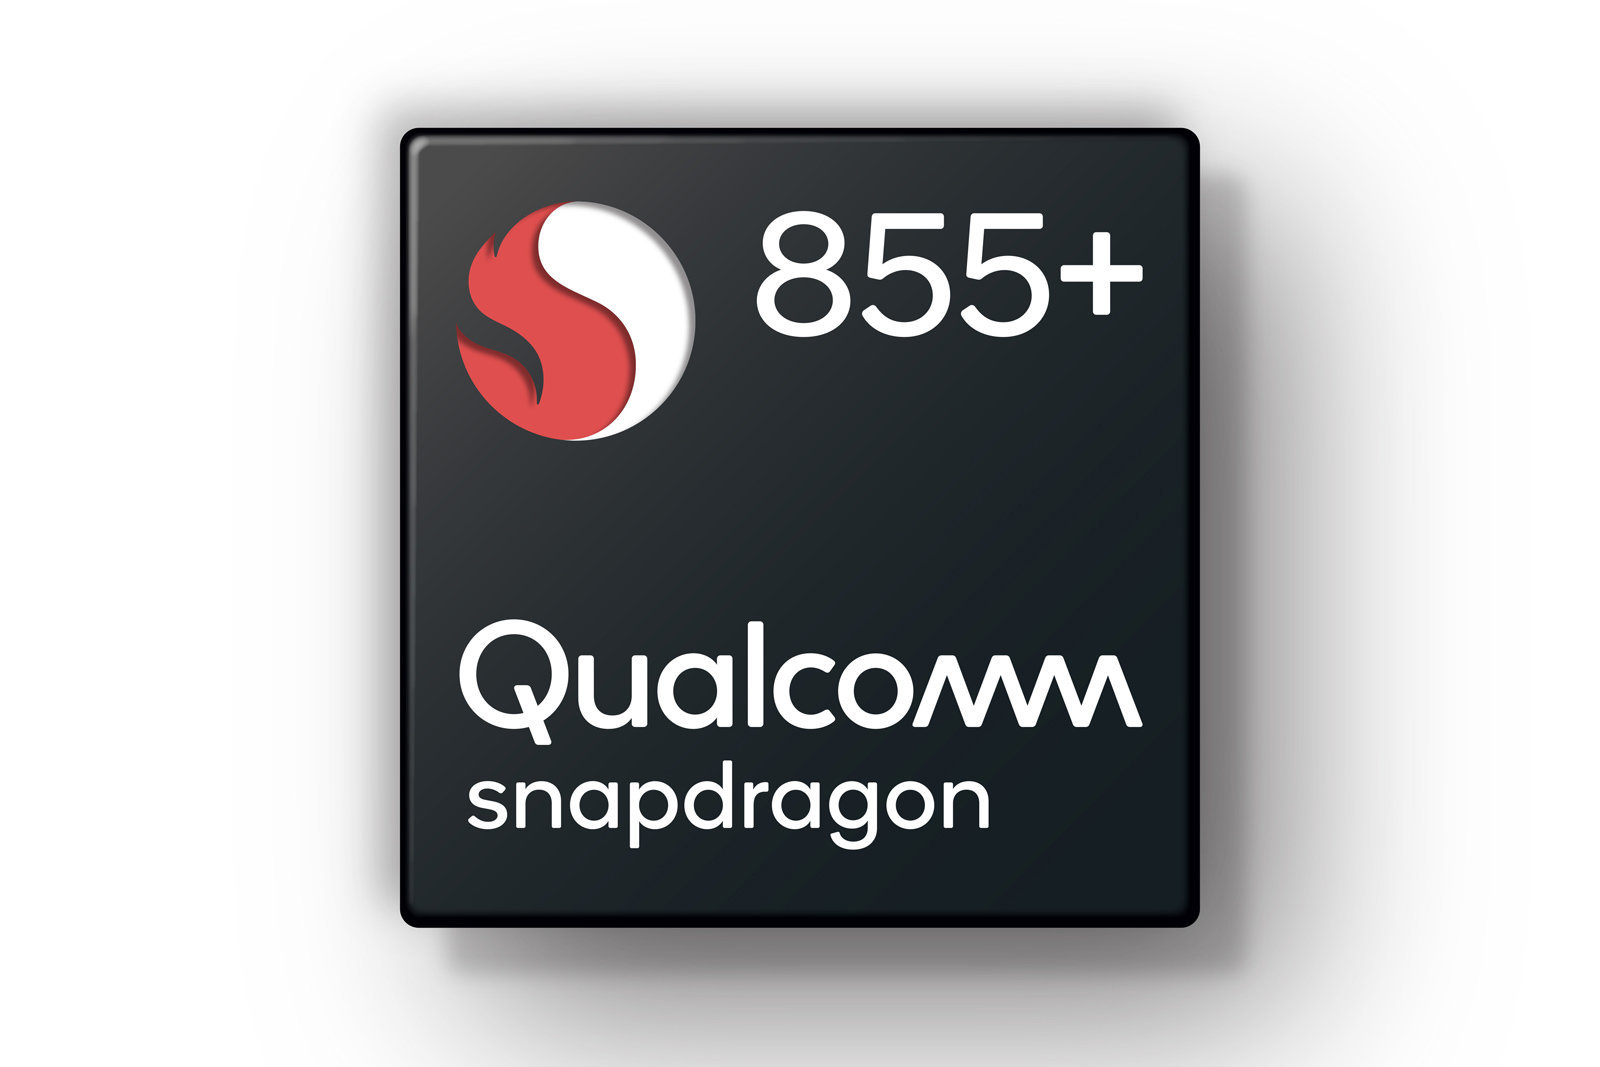 snapdragon 855 plus 2